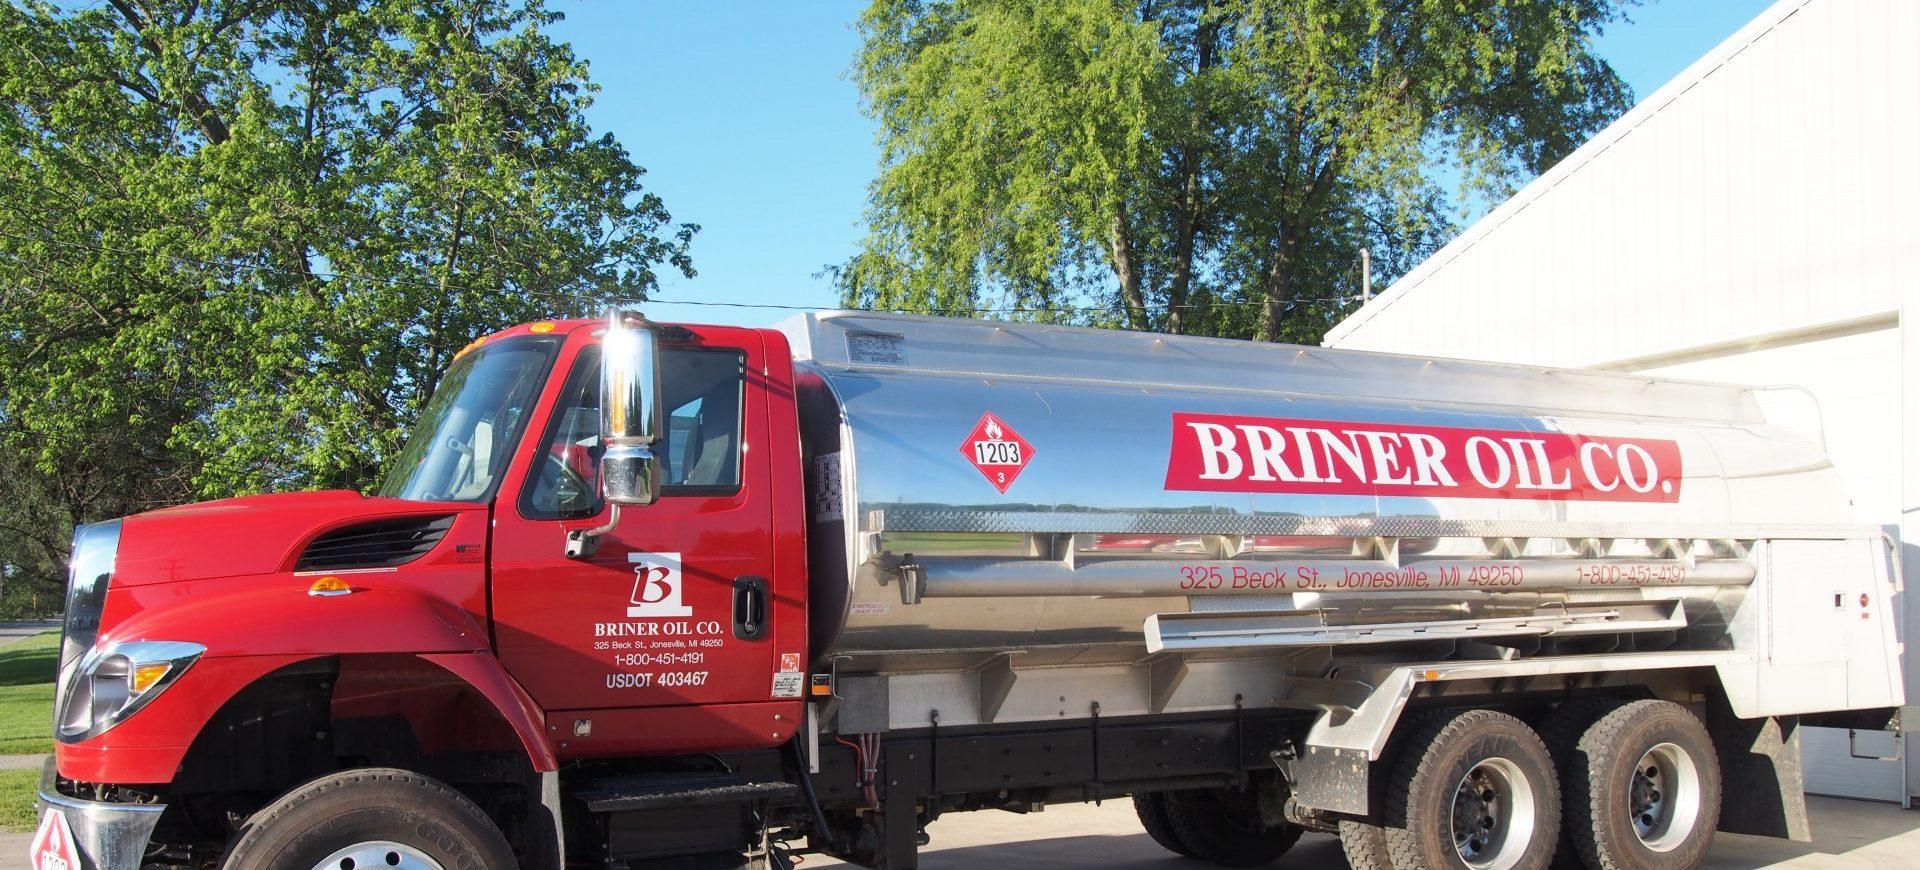 Briner Oil Co.